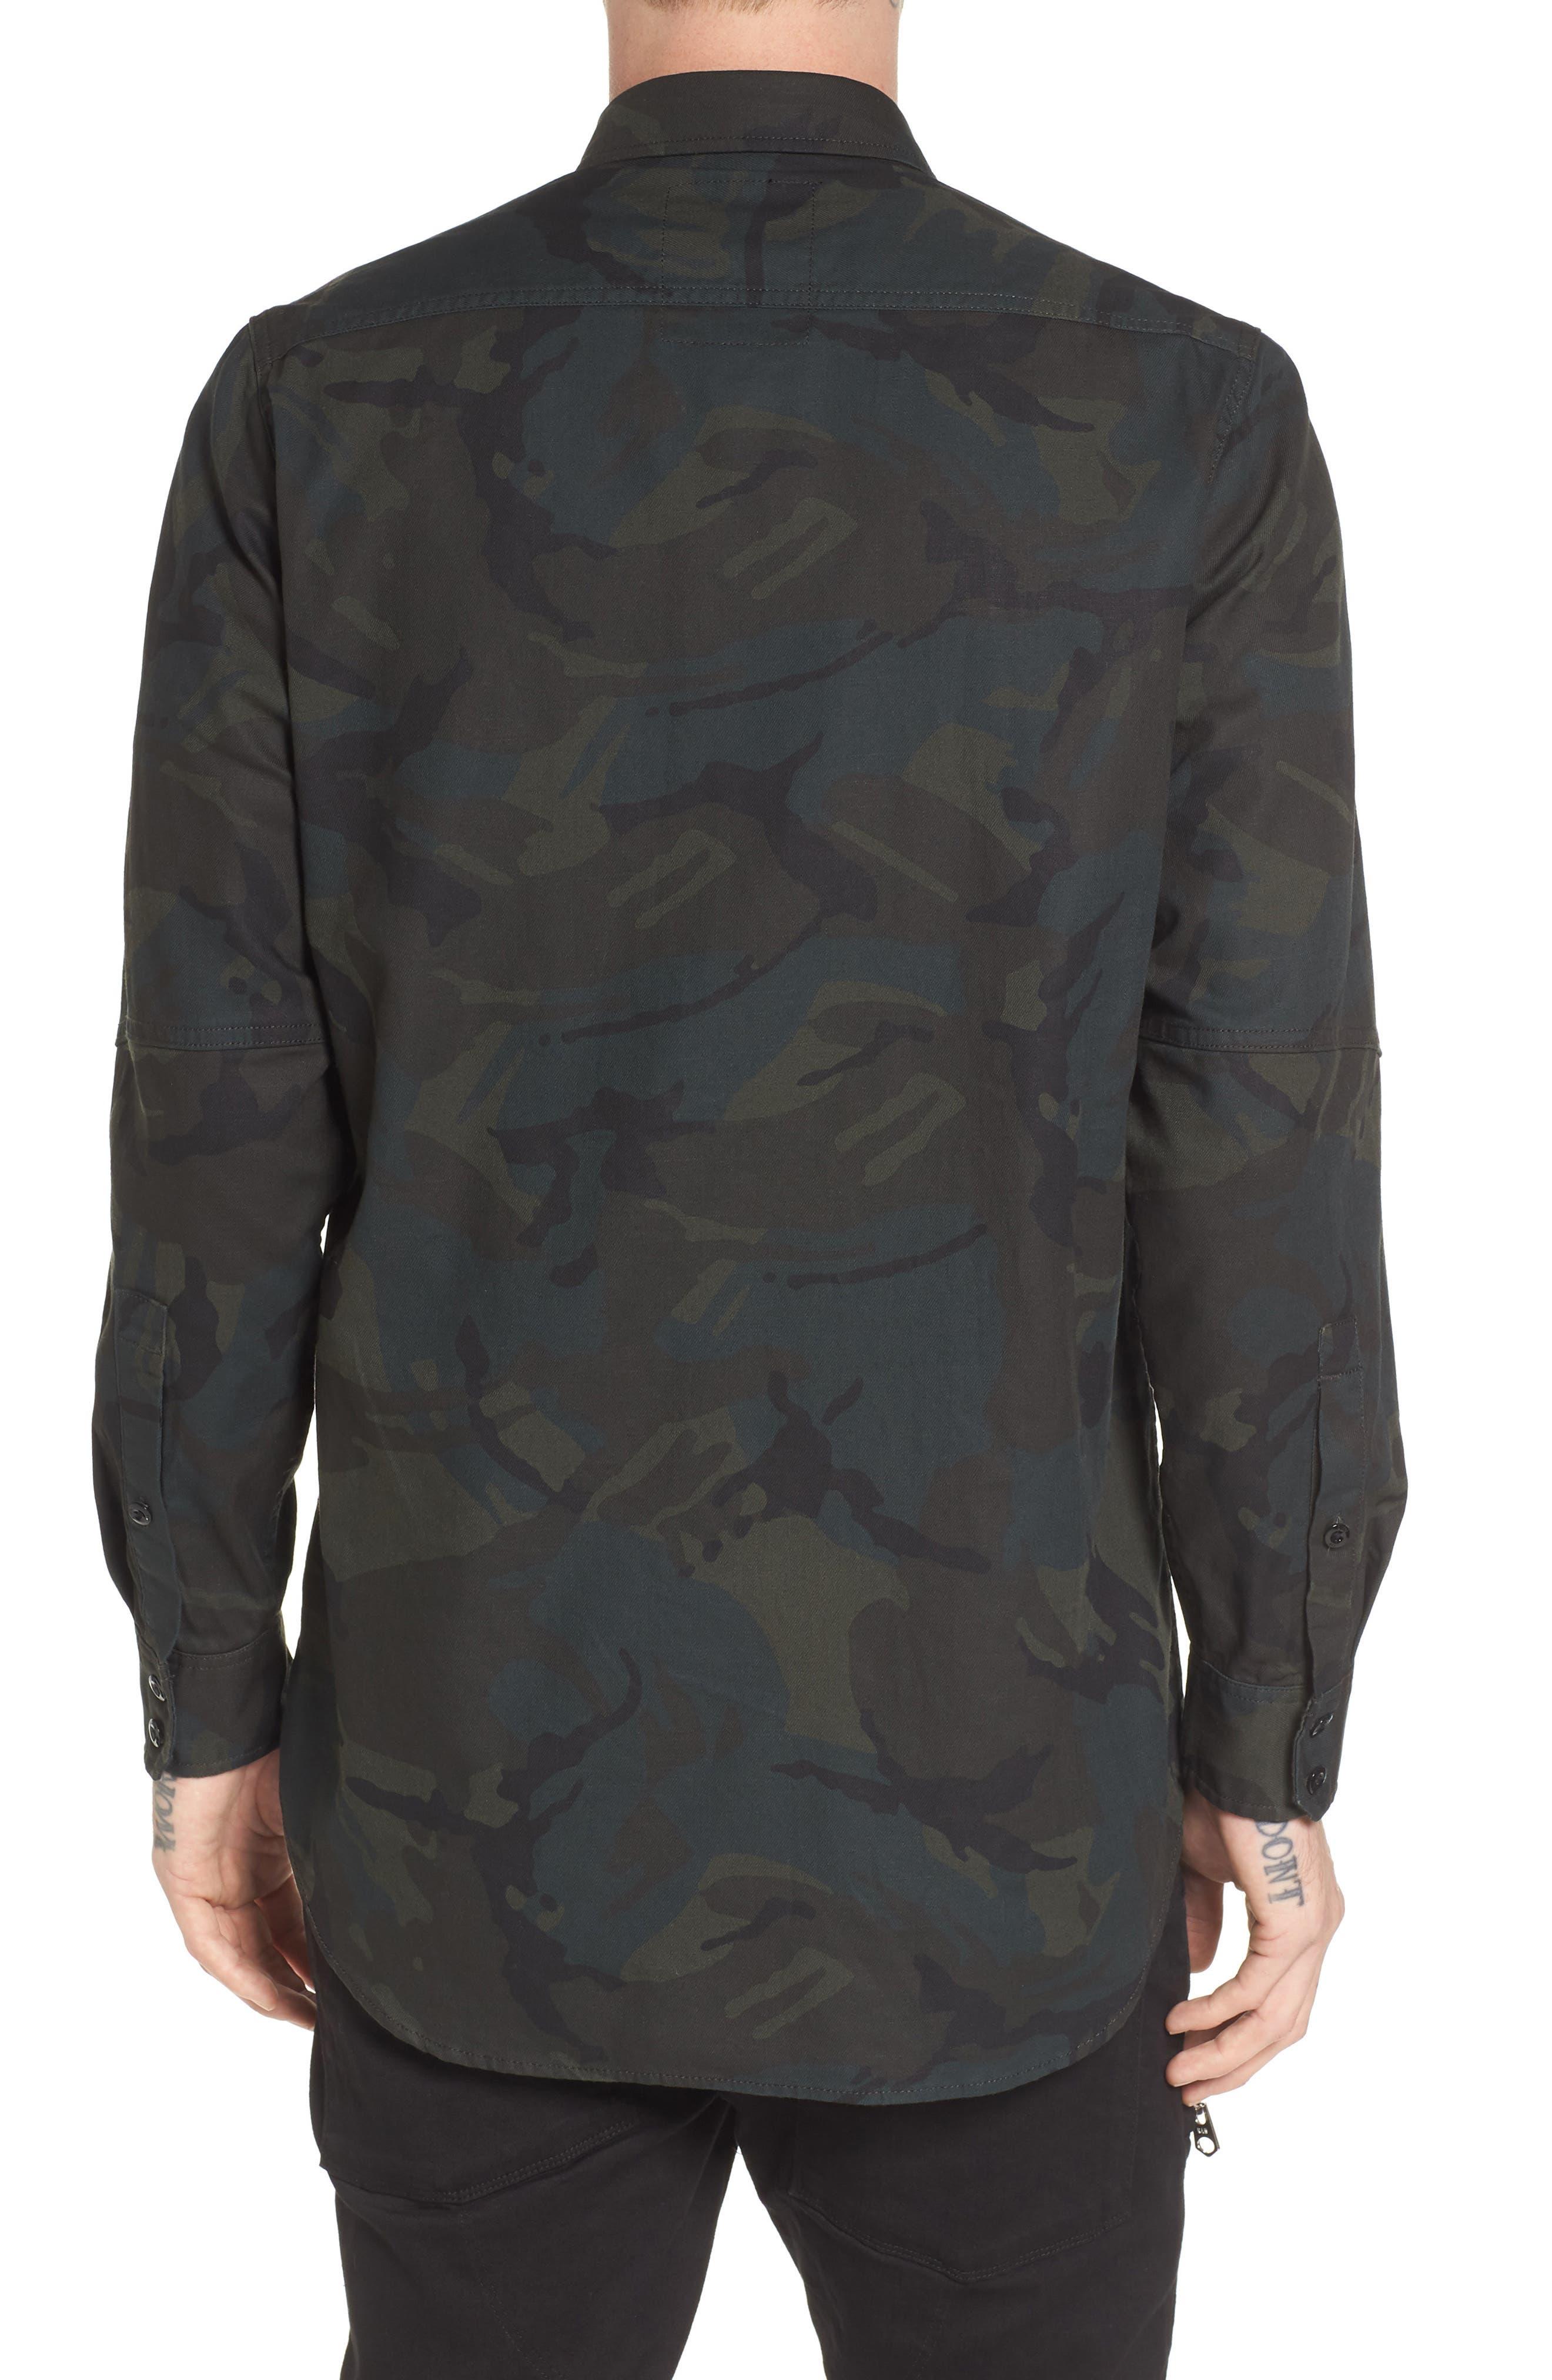 Stalt Long Sleeve Denim Shirt,                             Alternate thumbnail 2, color,                             Asphalt/ Black